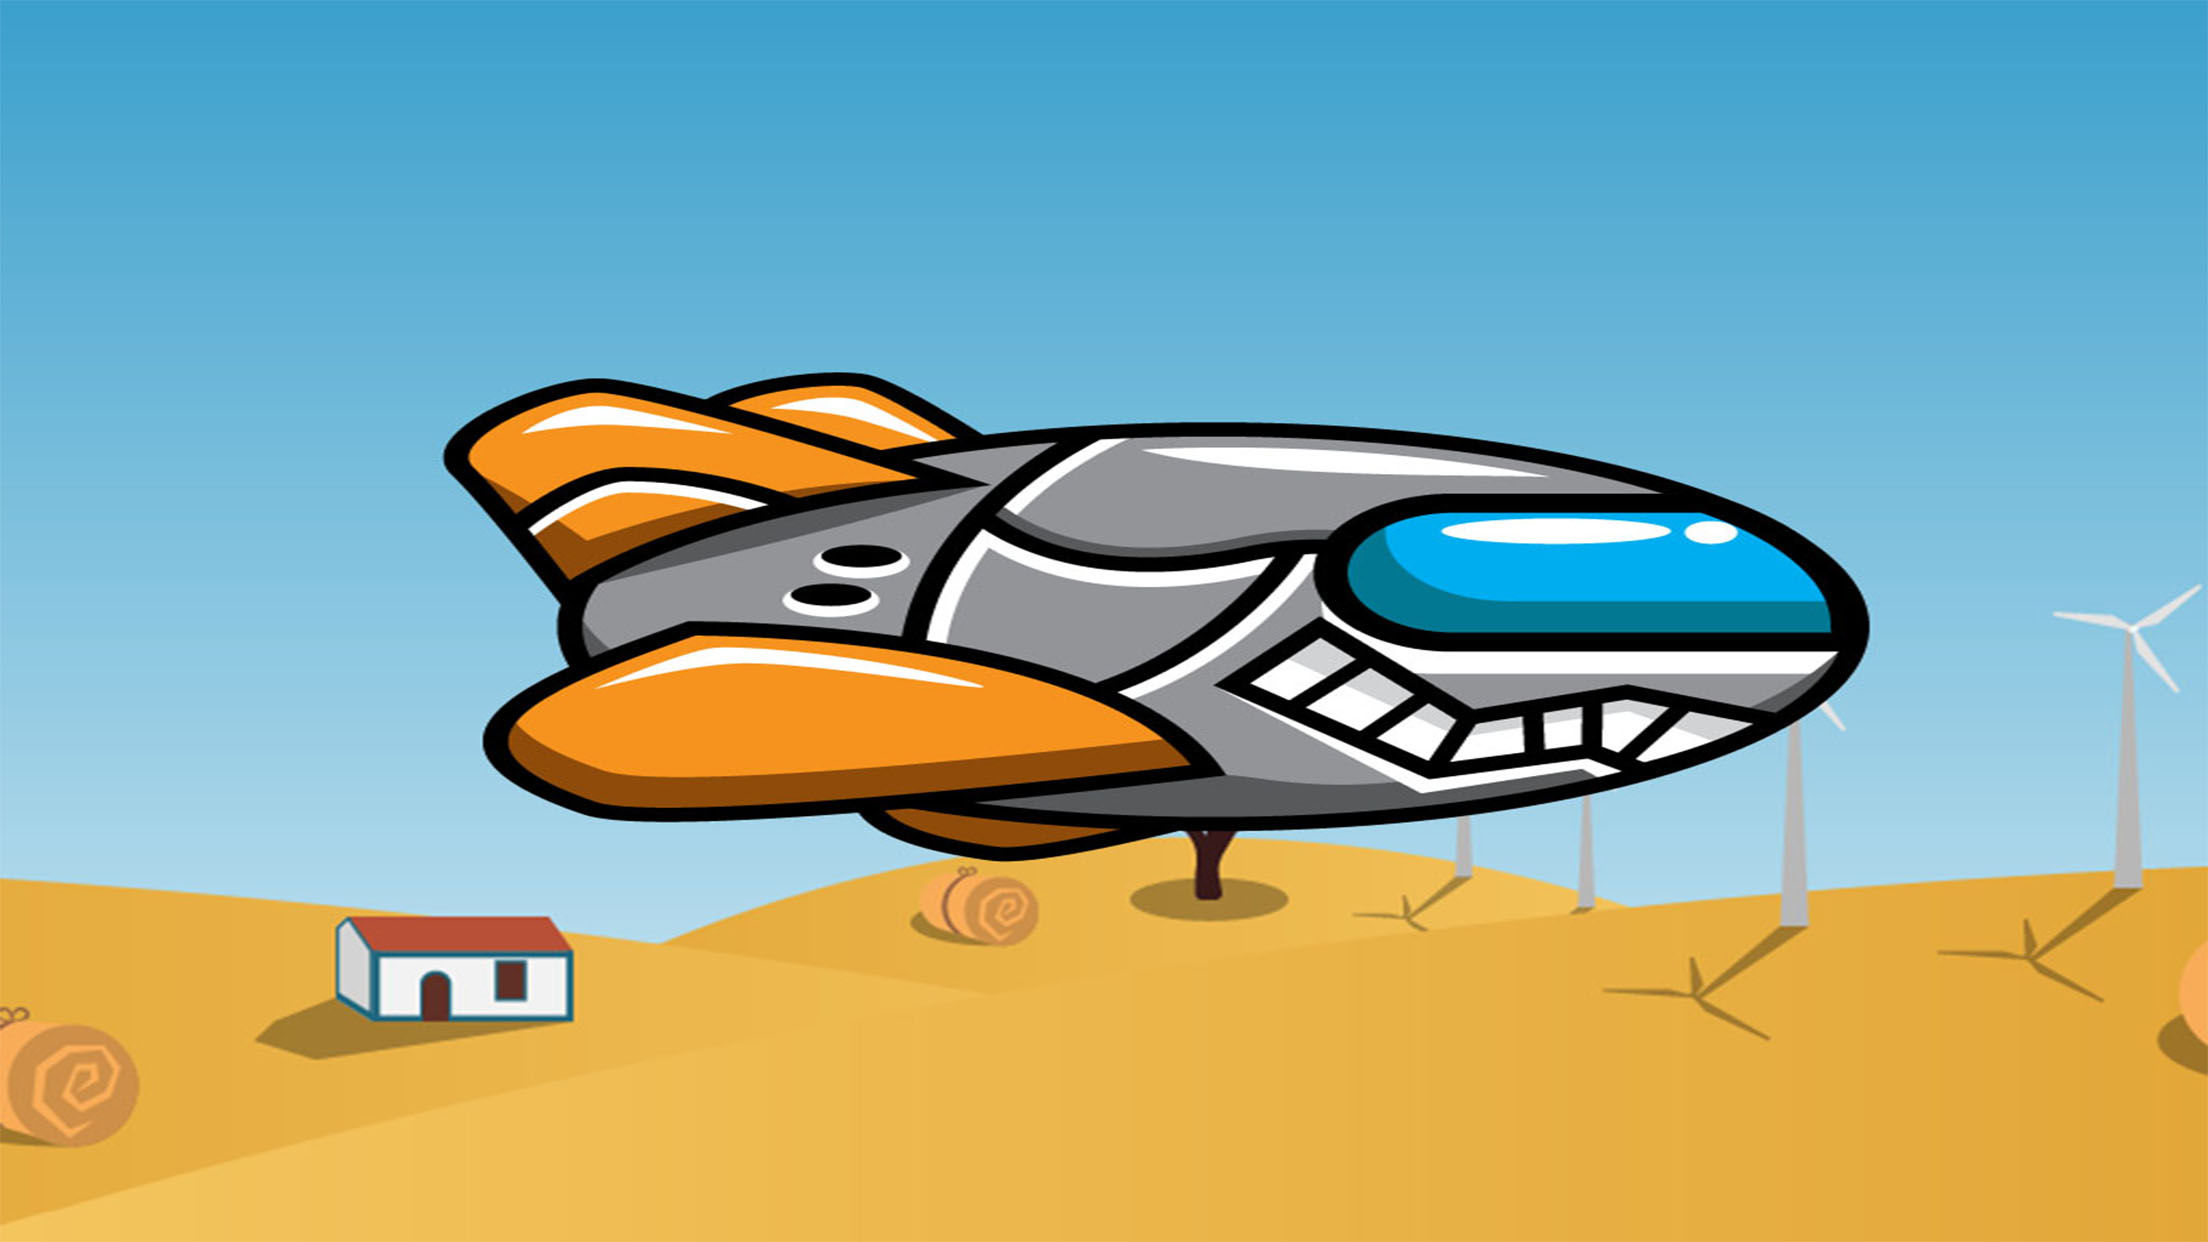 Spaceship Racer: Desert Ship by A.